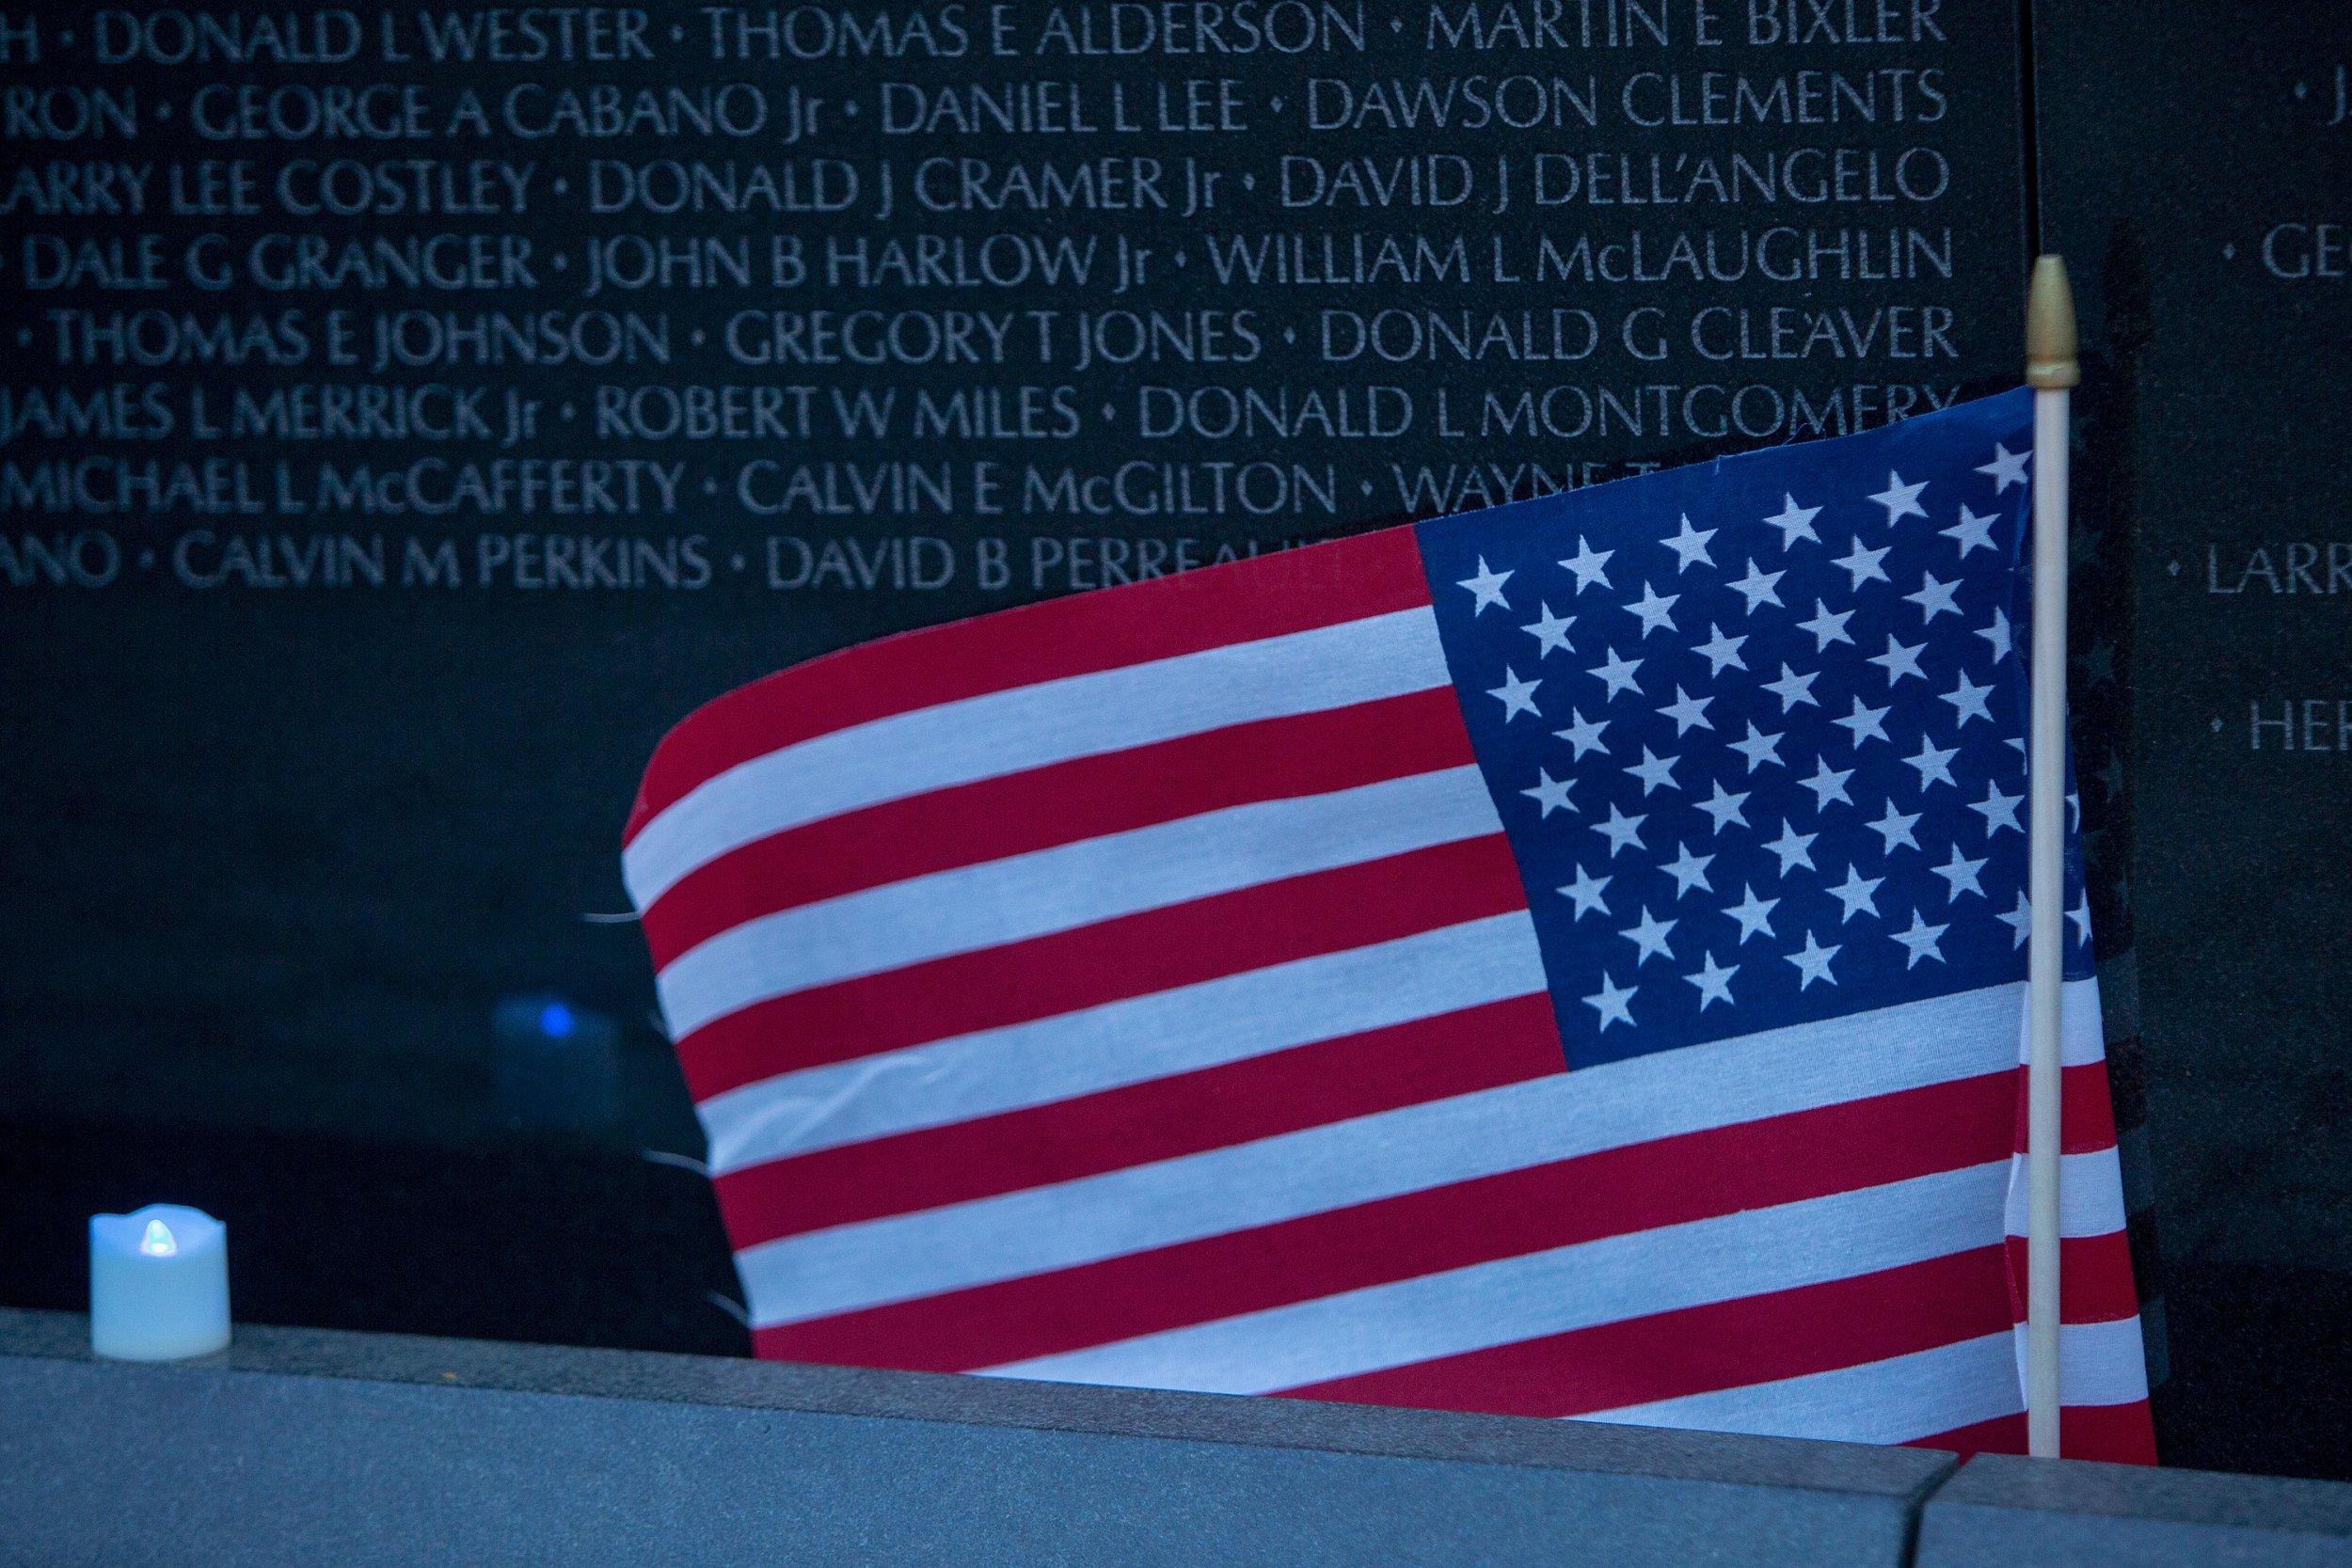 John McCain funeral, memorial service, live, Obama, Bush